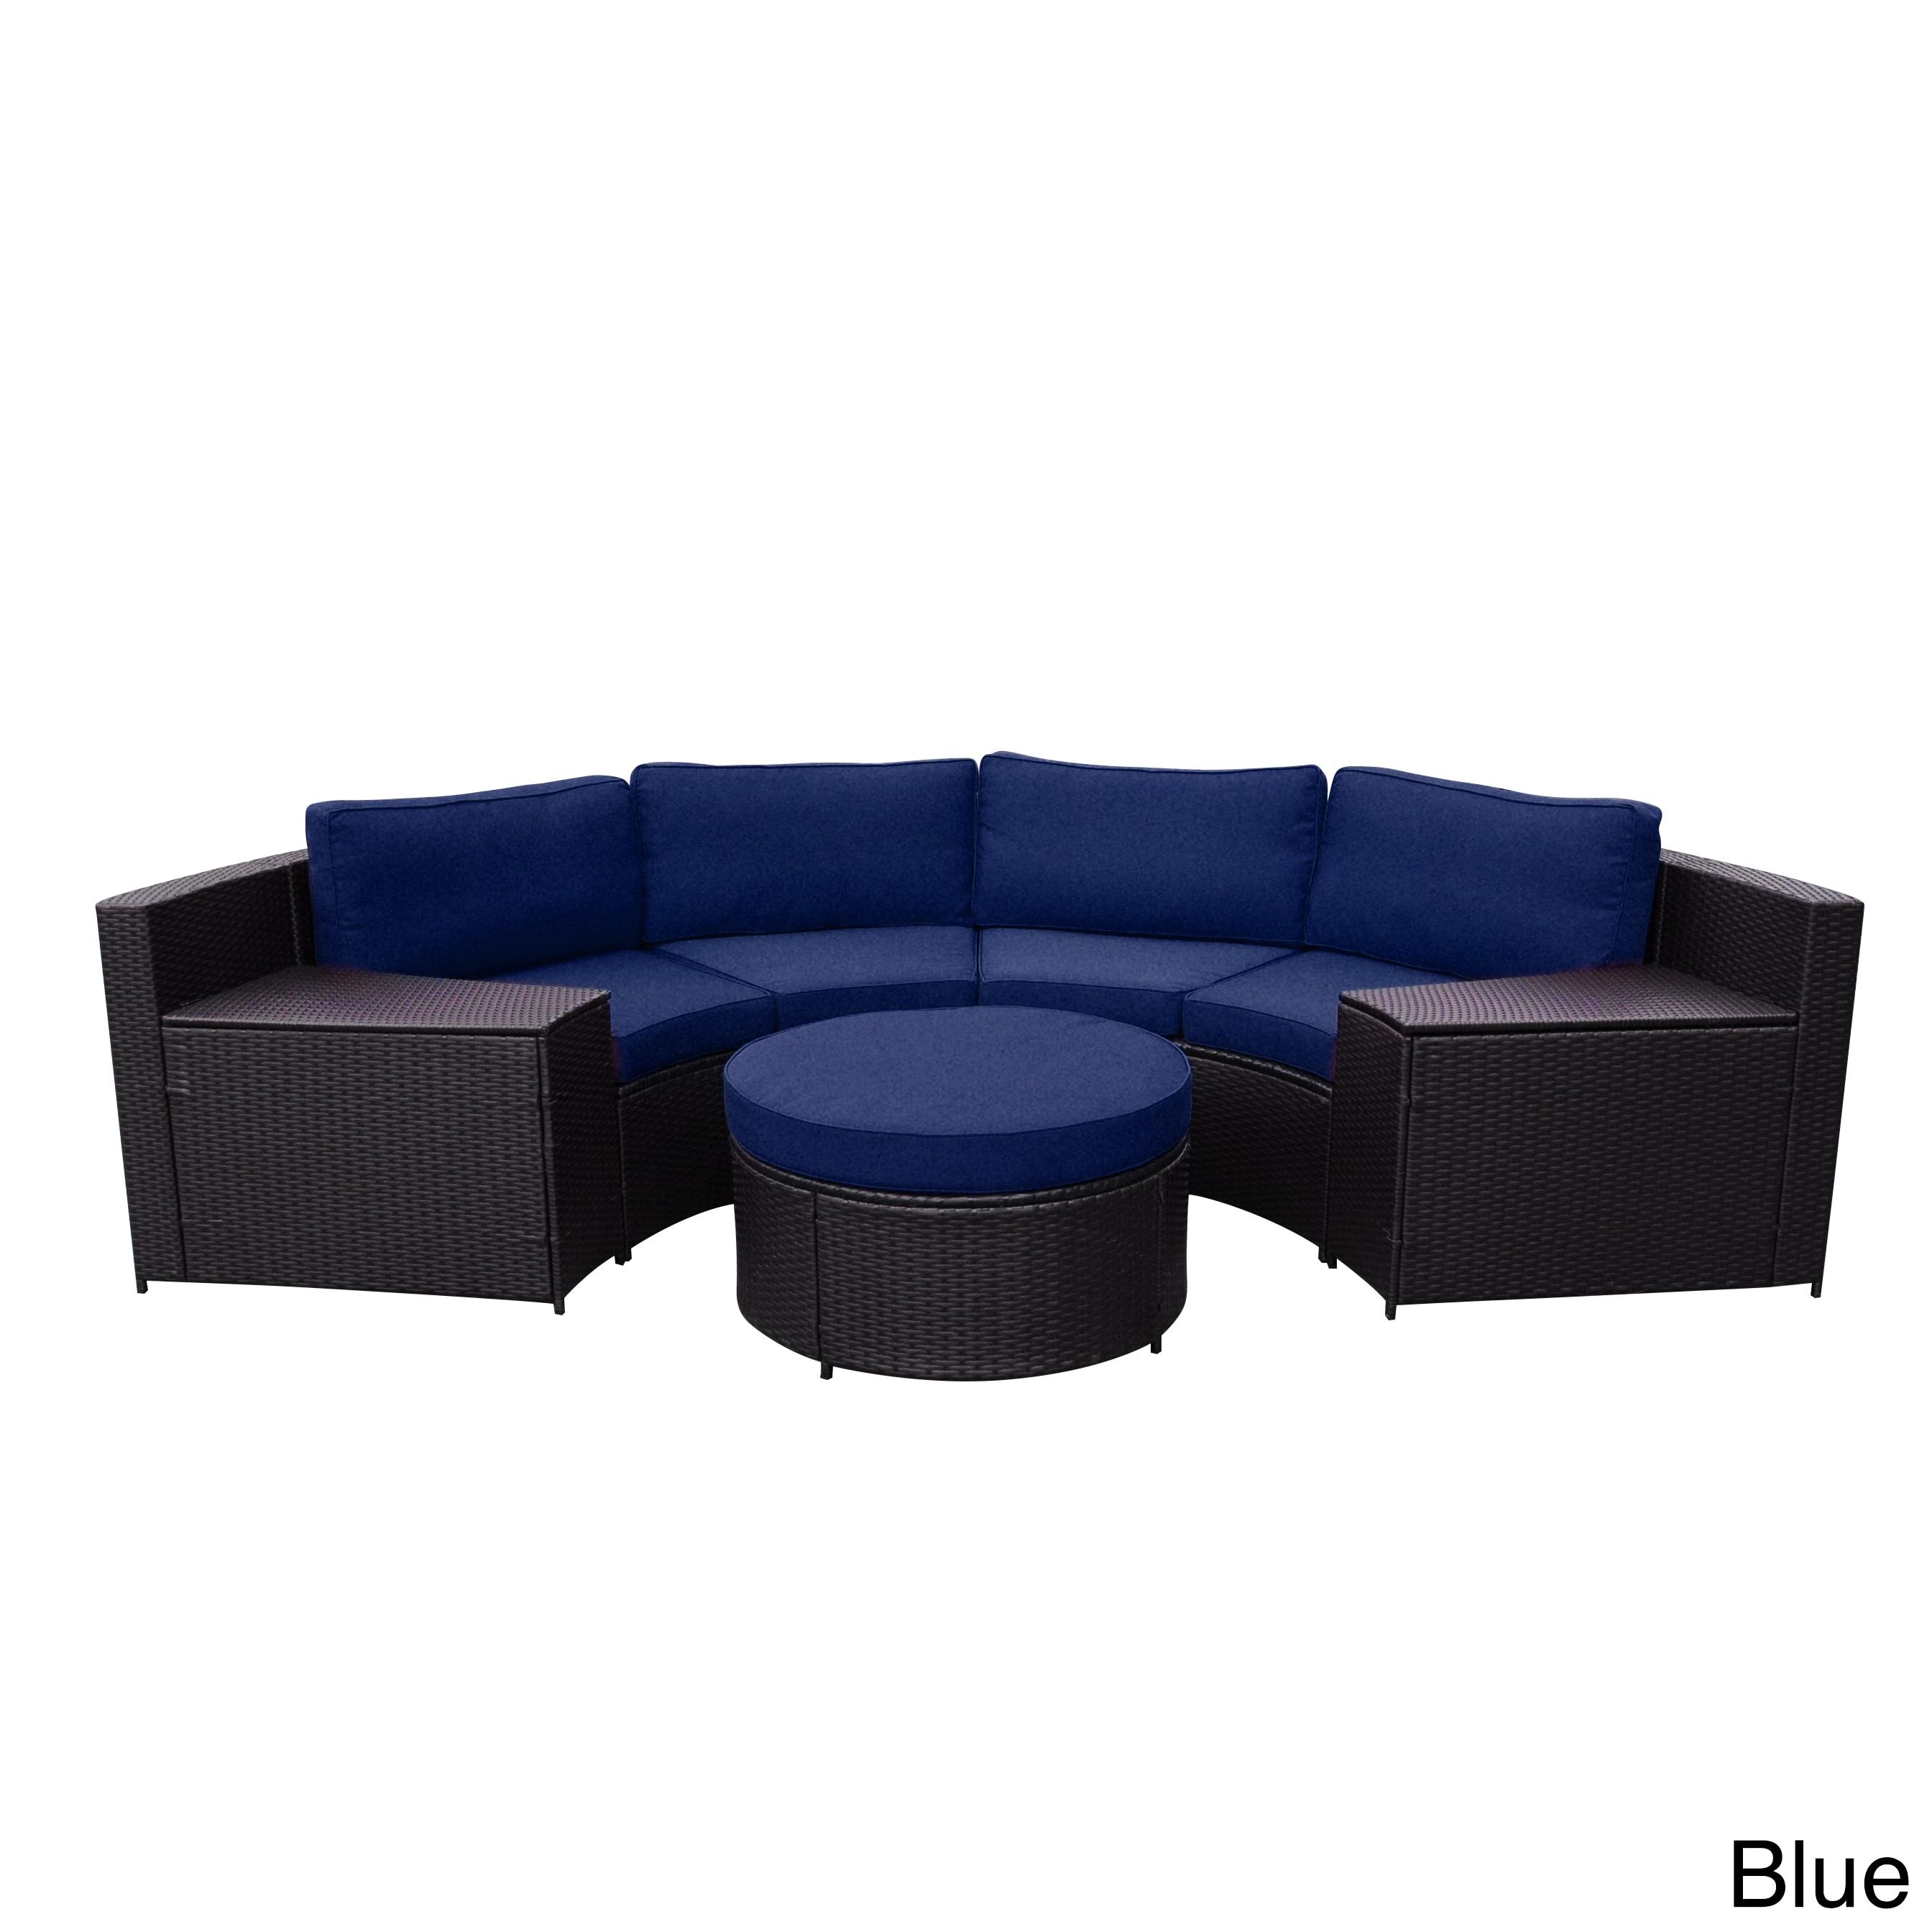 Cartagena Curved Modular Wicker Sofa With Cushions